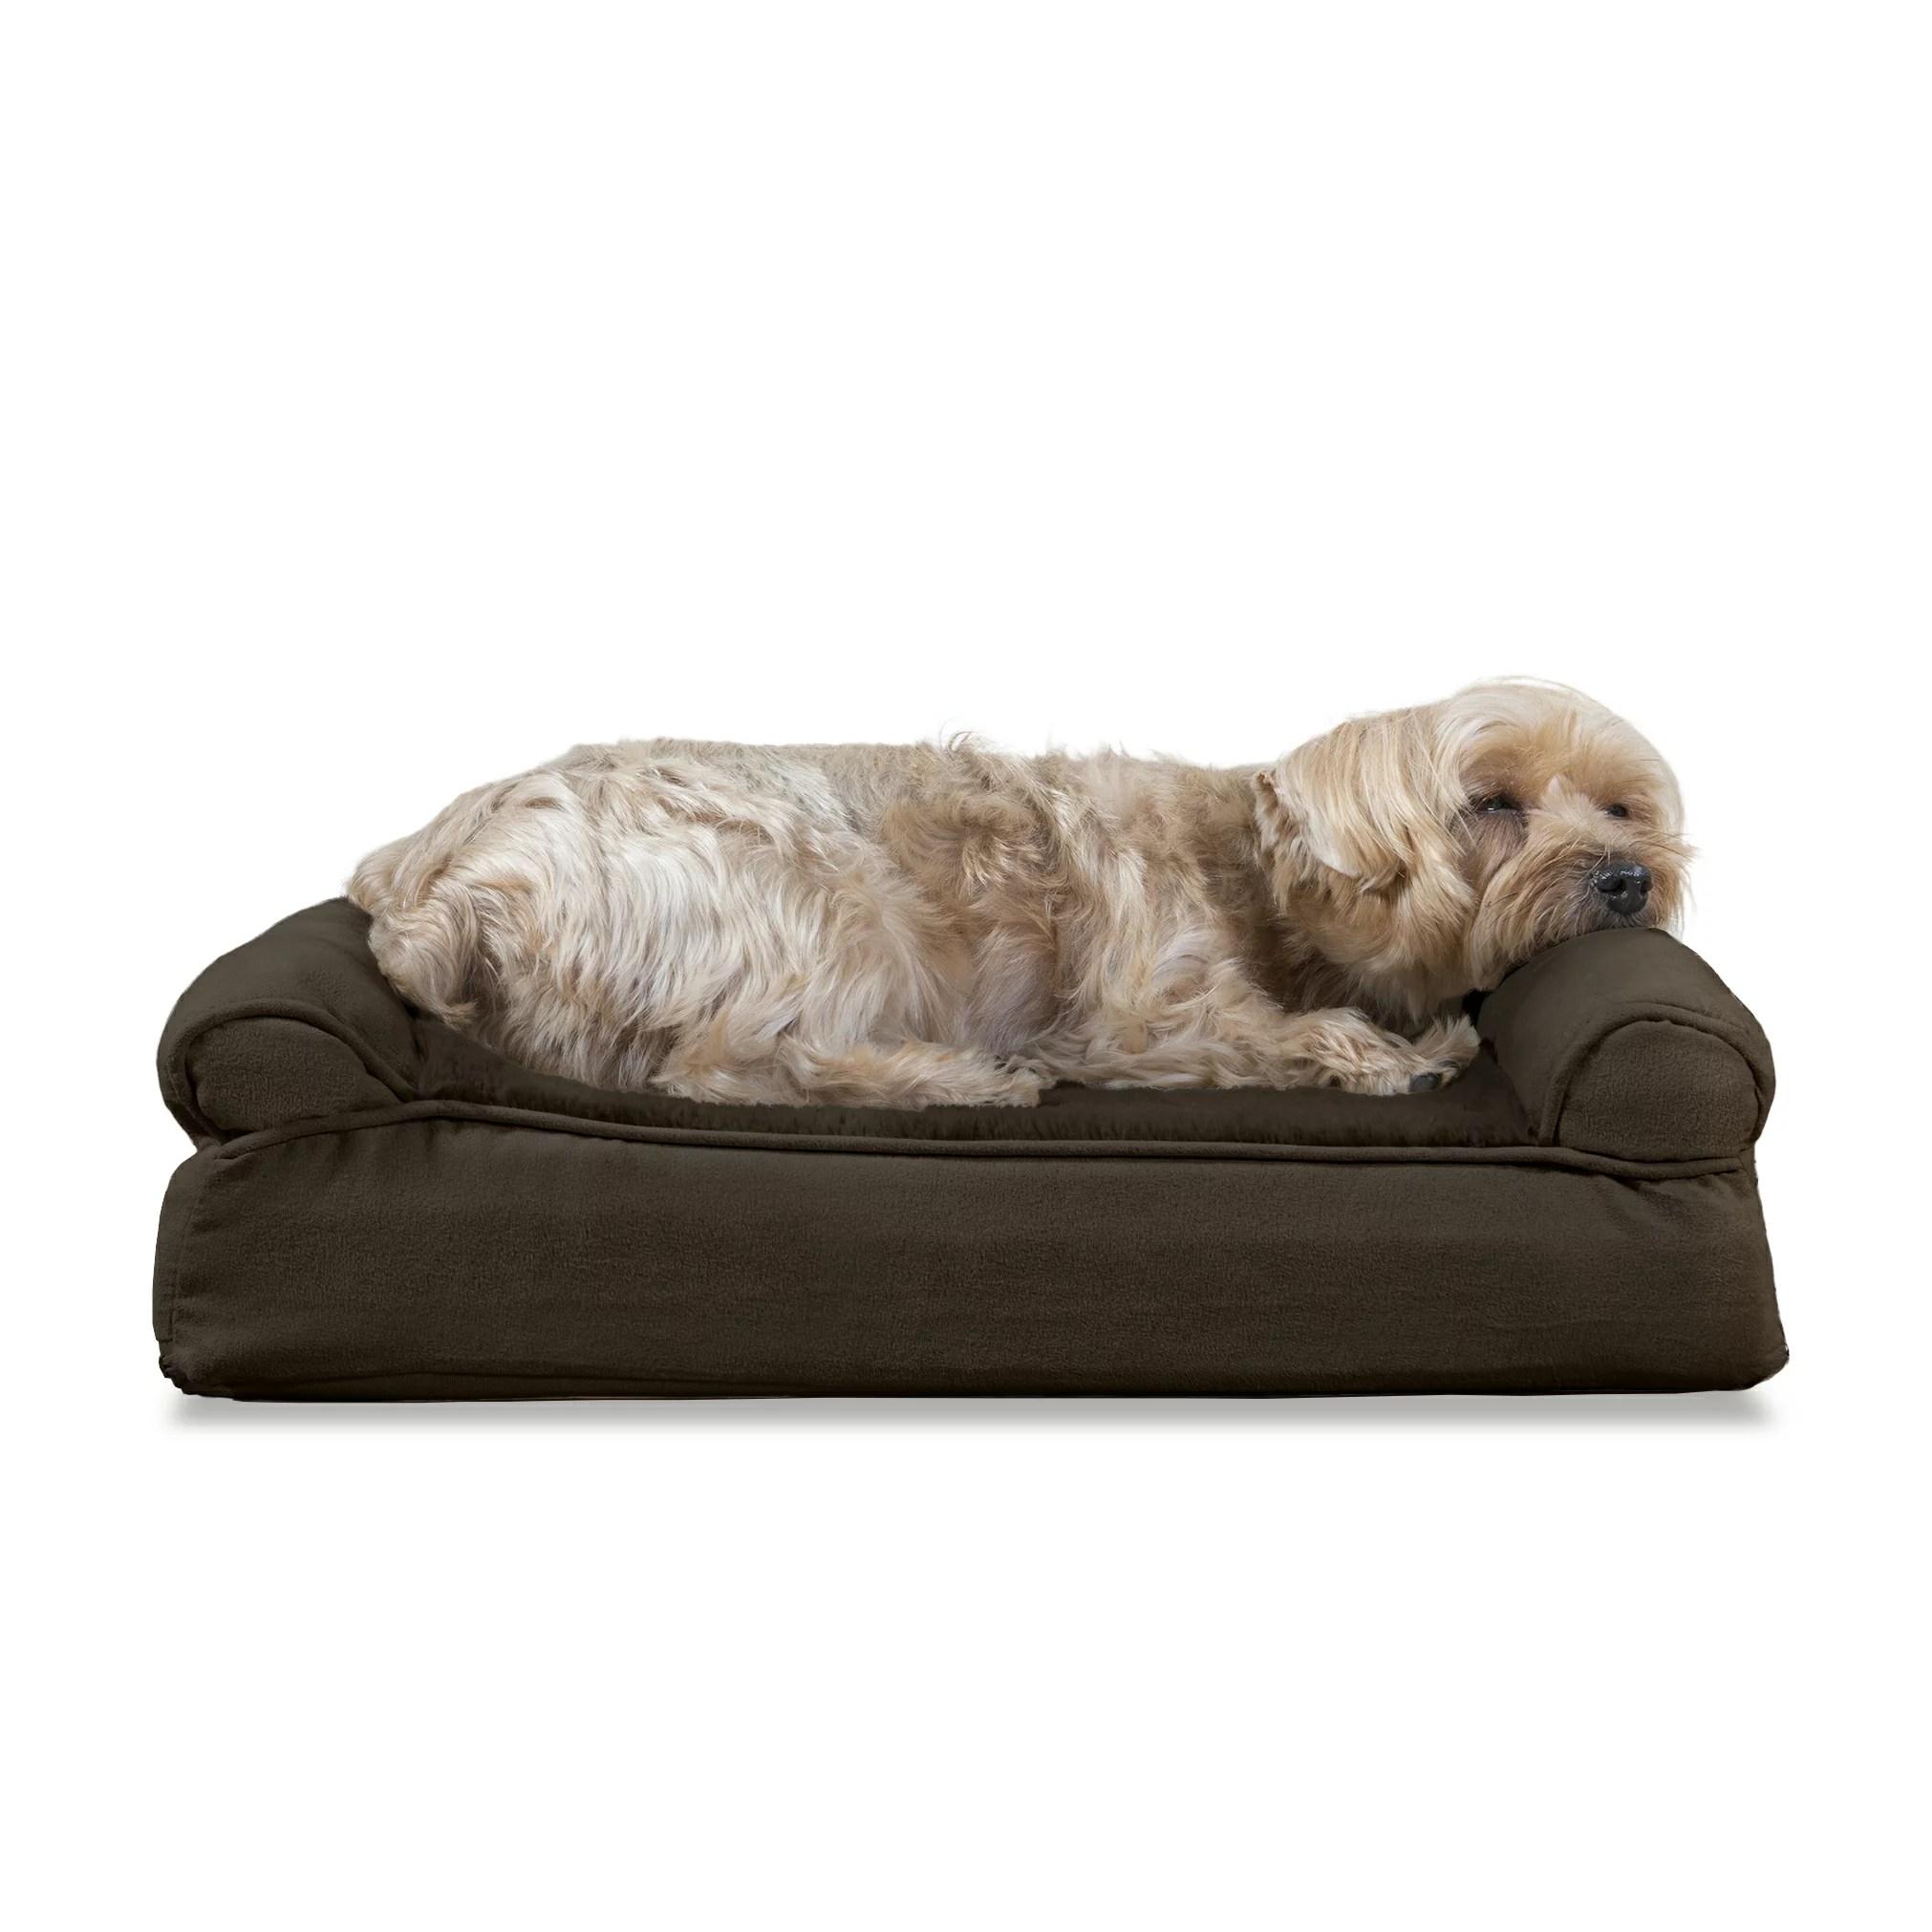 pet dog sofa cheap deals online furhaven products bed memory foam